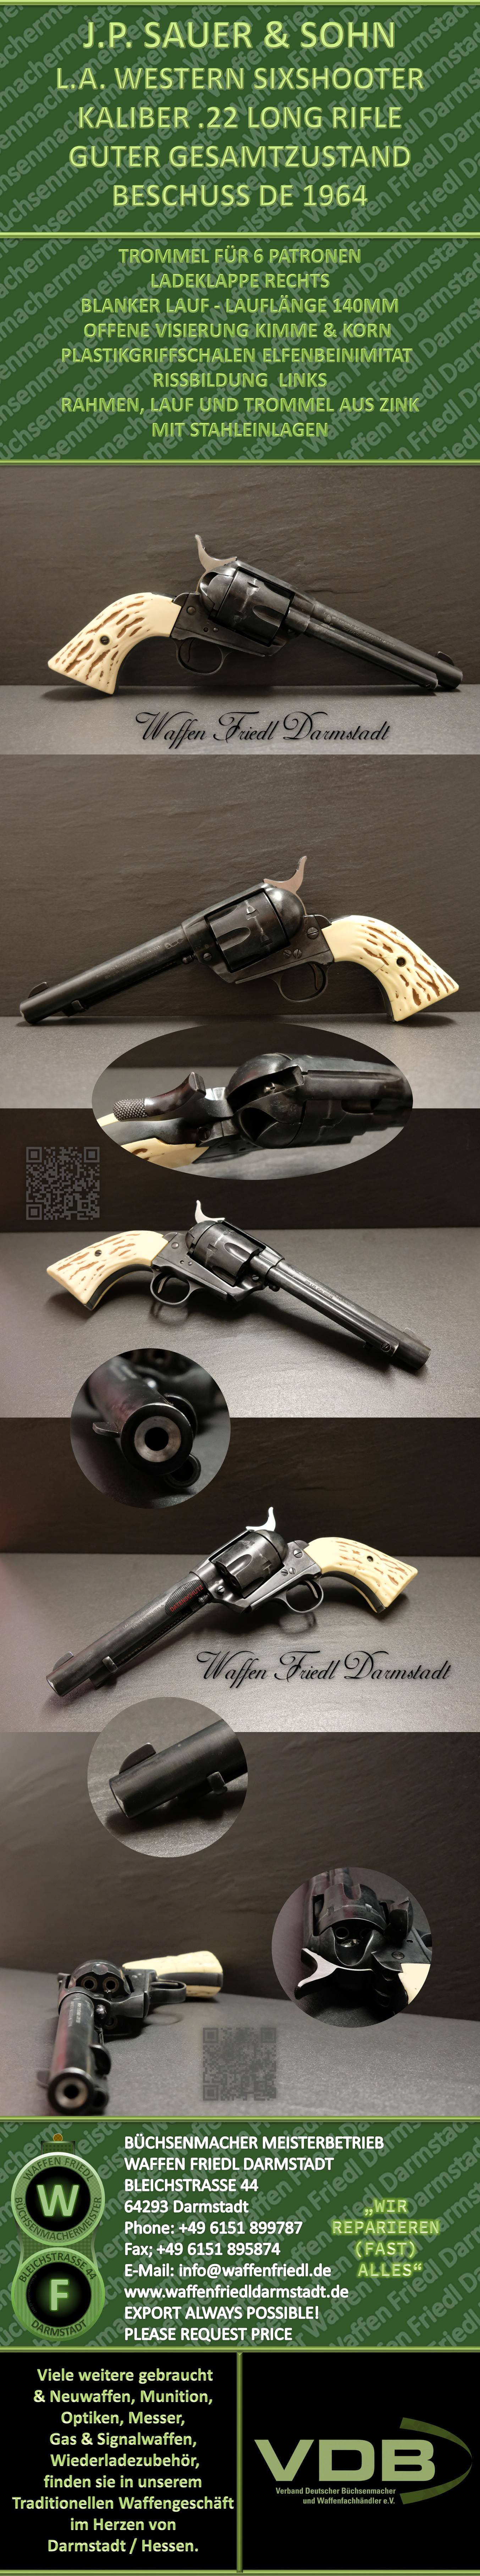 J.P. SAUER & SOHN - KALIBER .22 Long Rifle - MODELL L.A. SIXSHOOTER